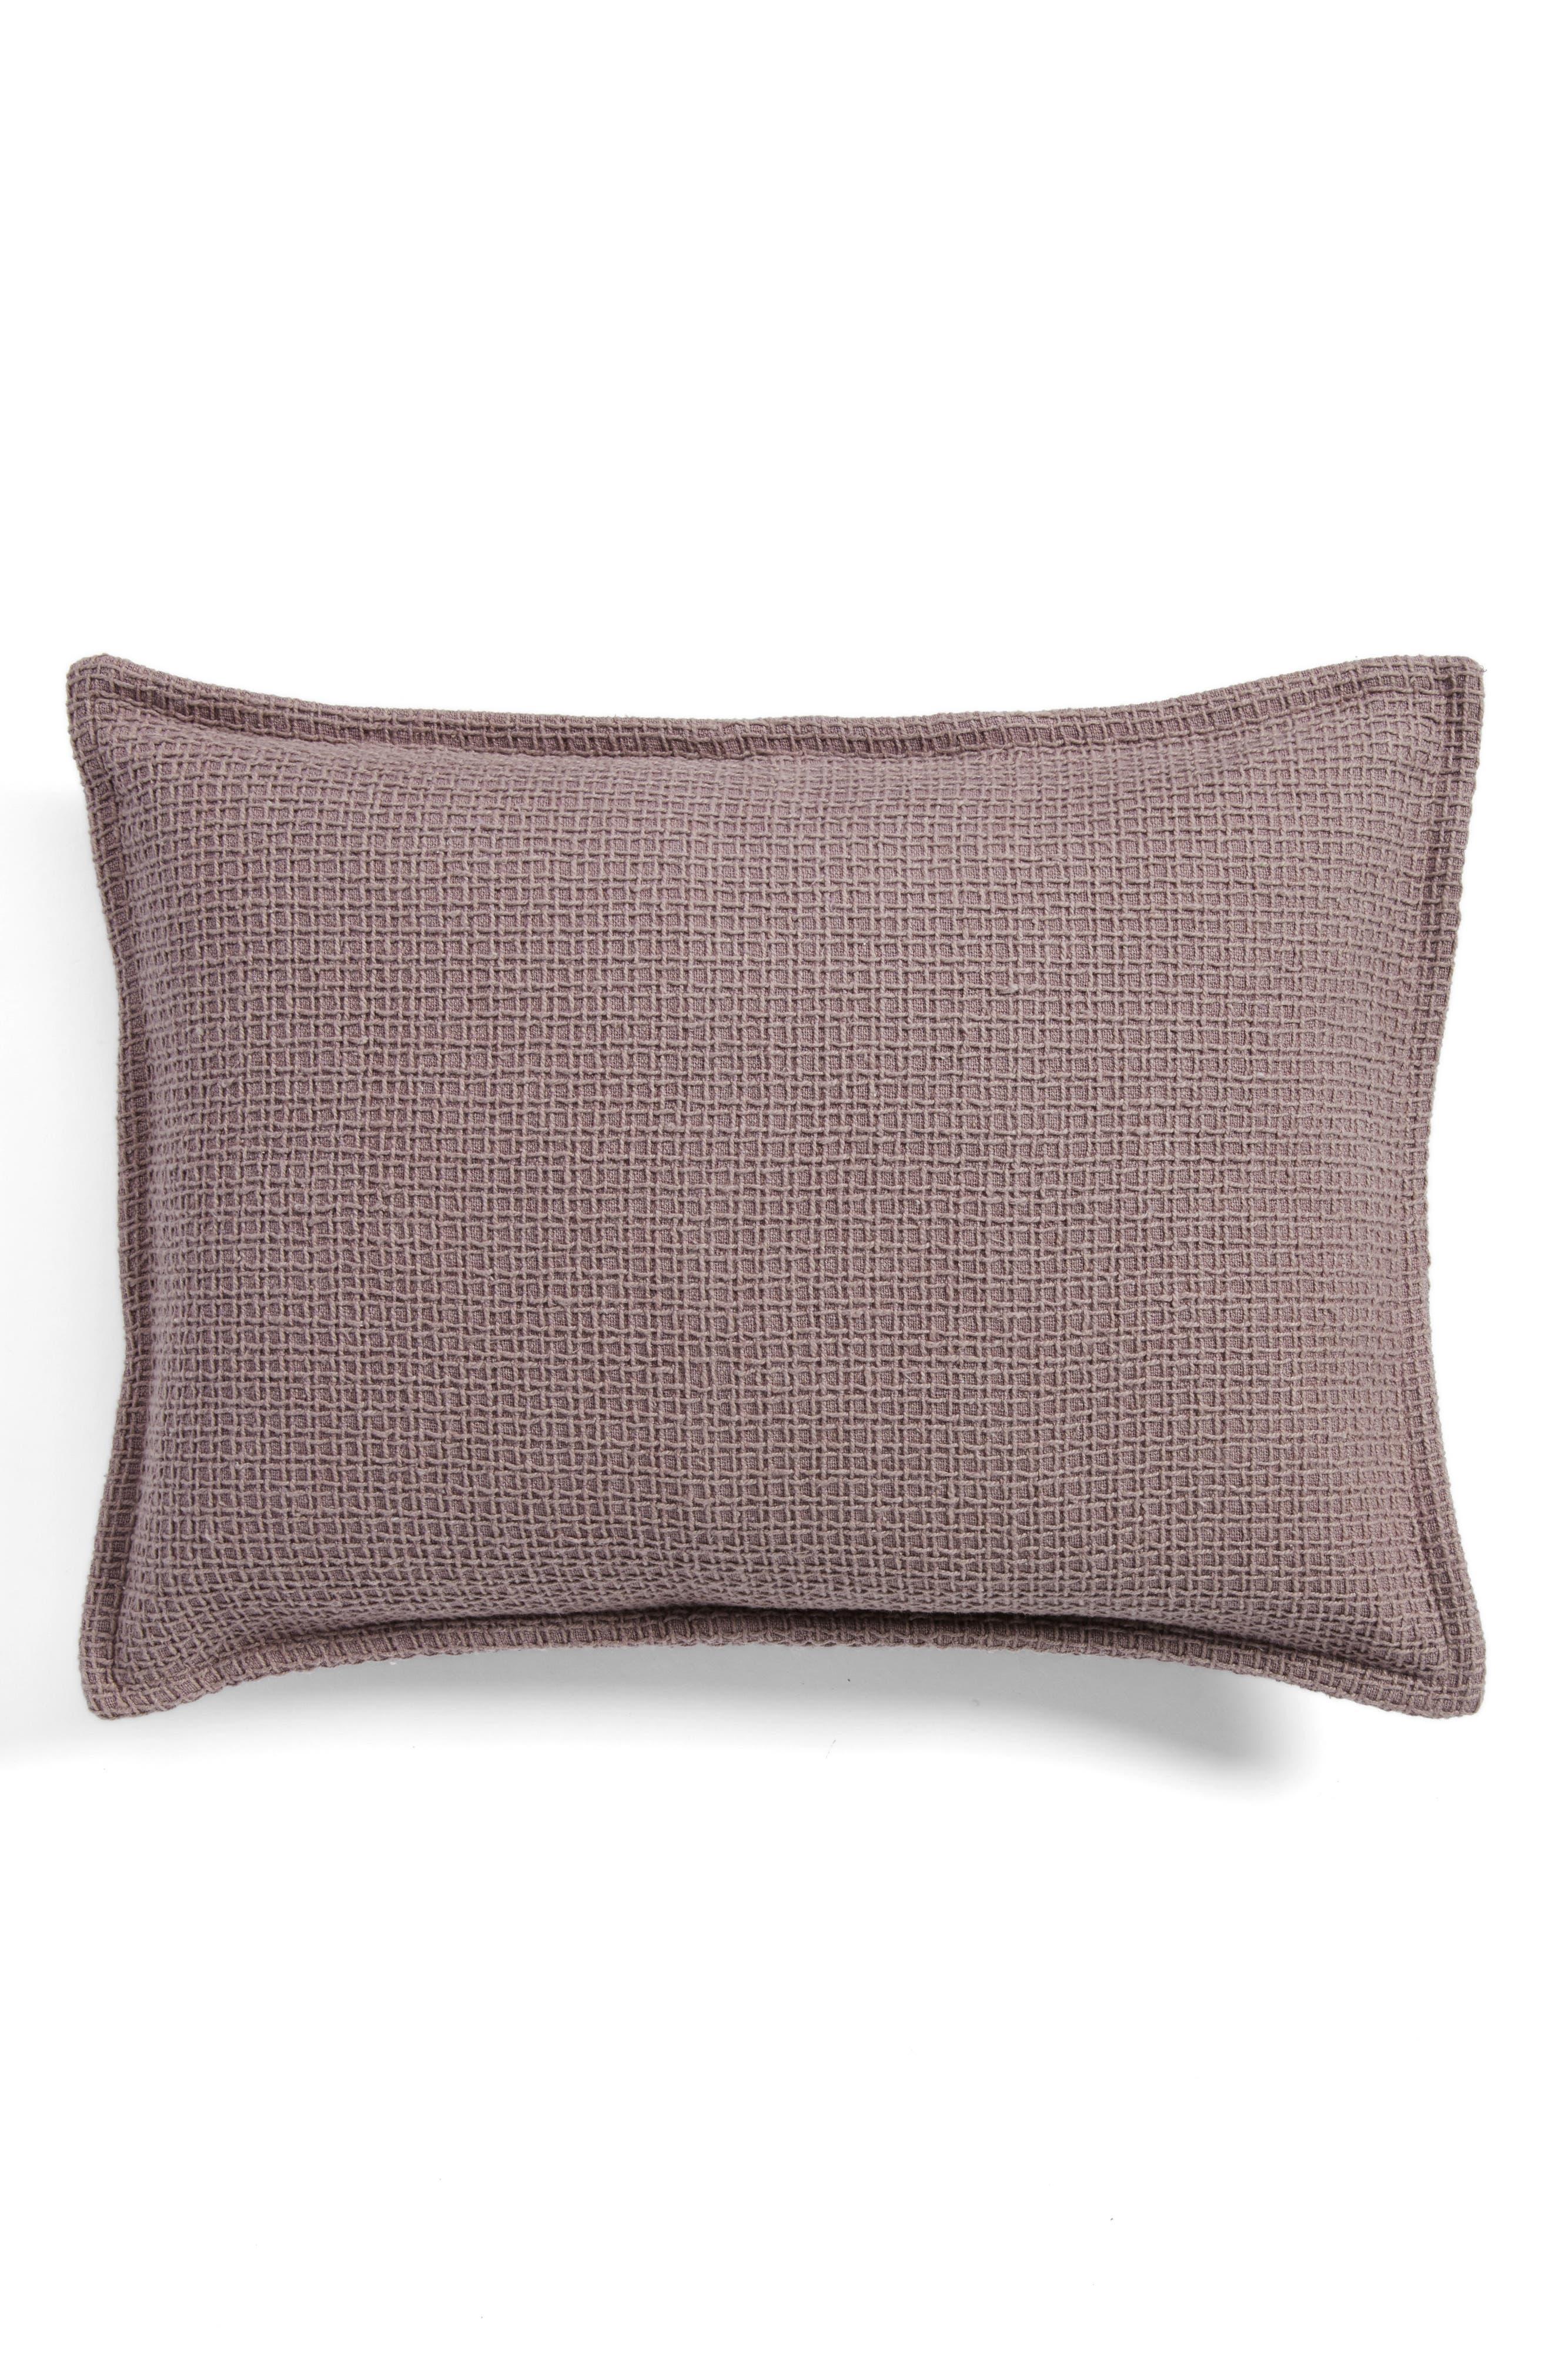 Floral Jacquard Breakfast Pillow,                             Main thumbnail 2, color,